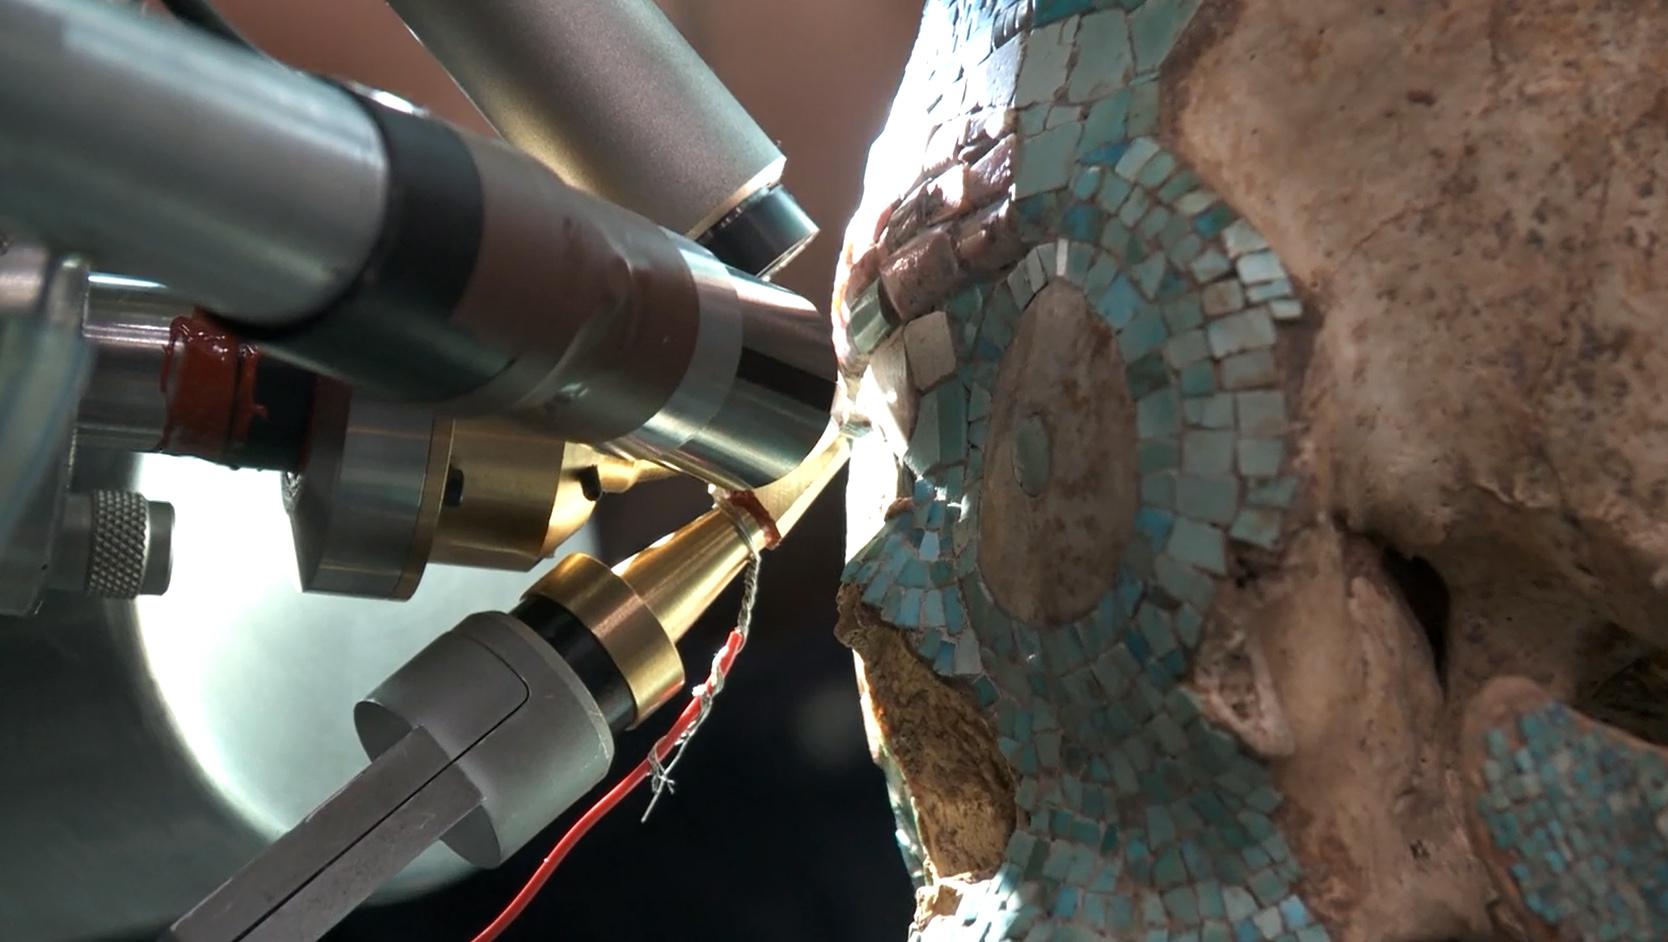 fake-mixtec-skull-museum-volkenkunde-leiden-schedel